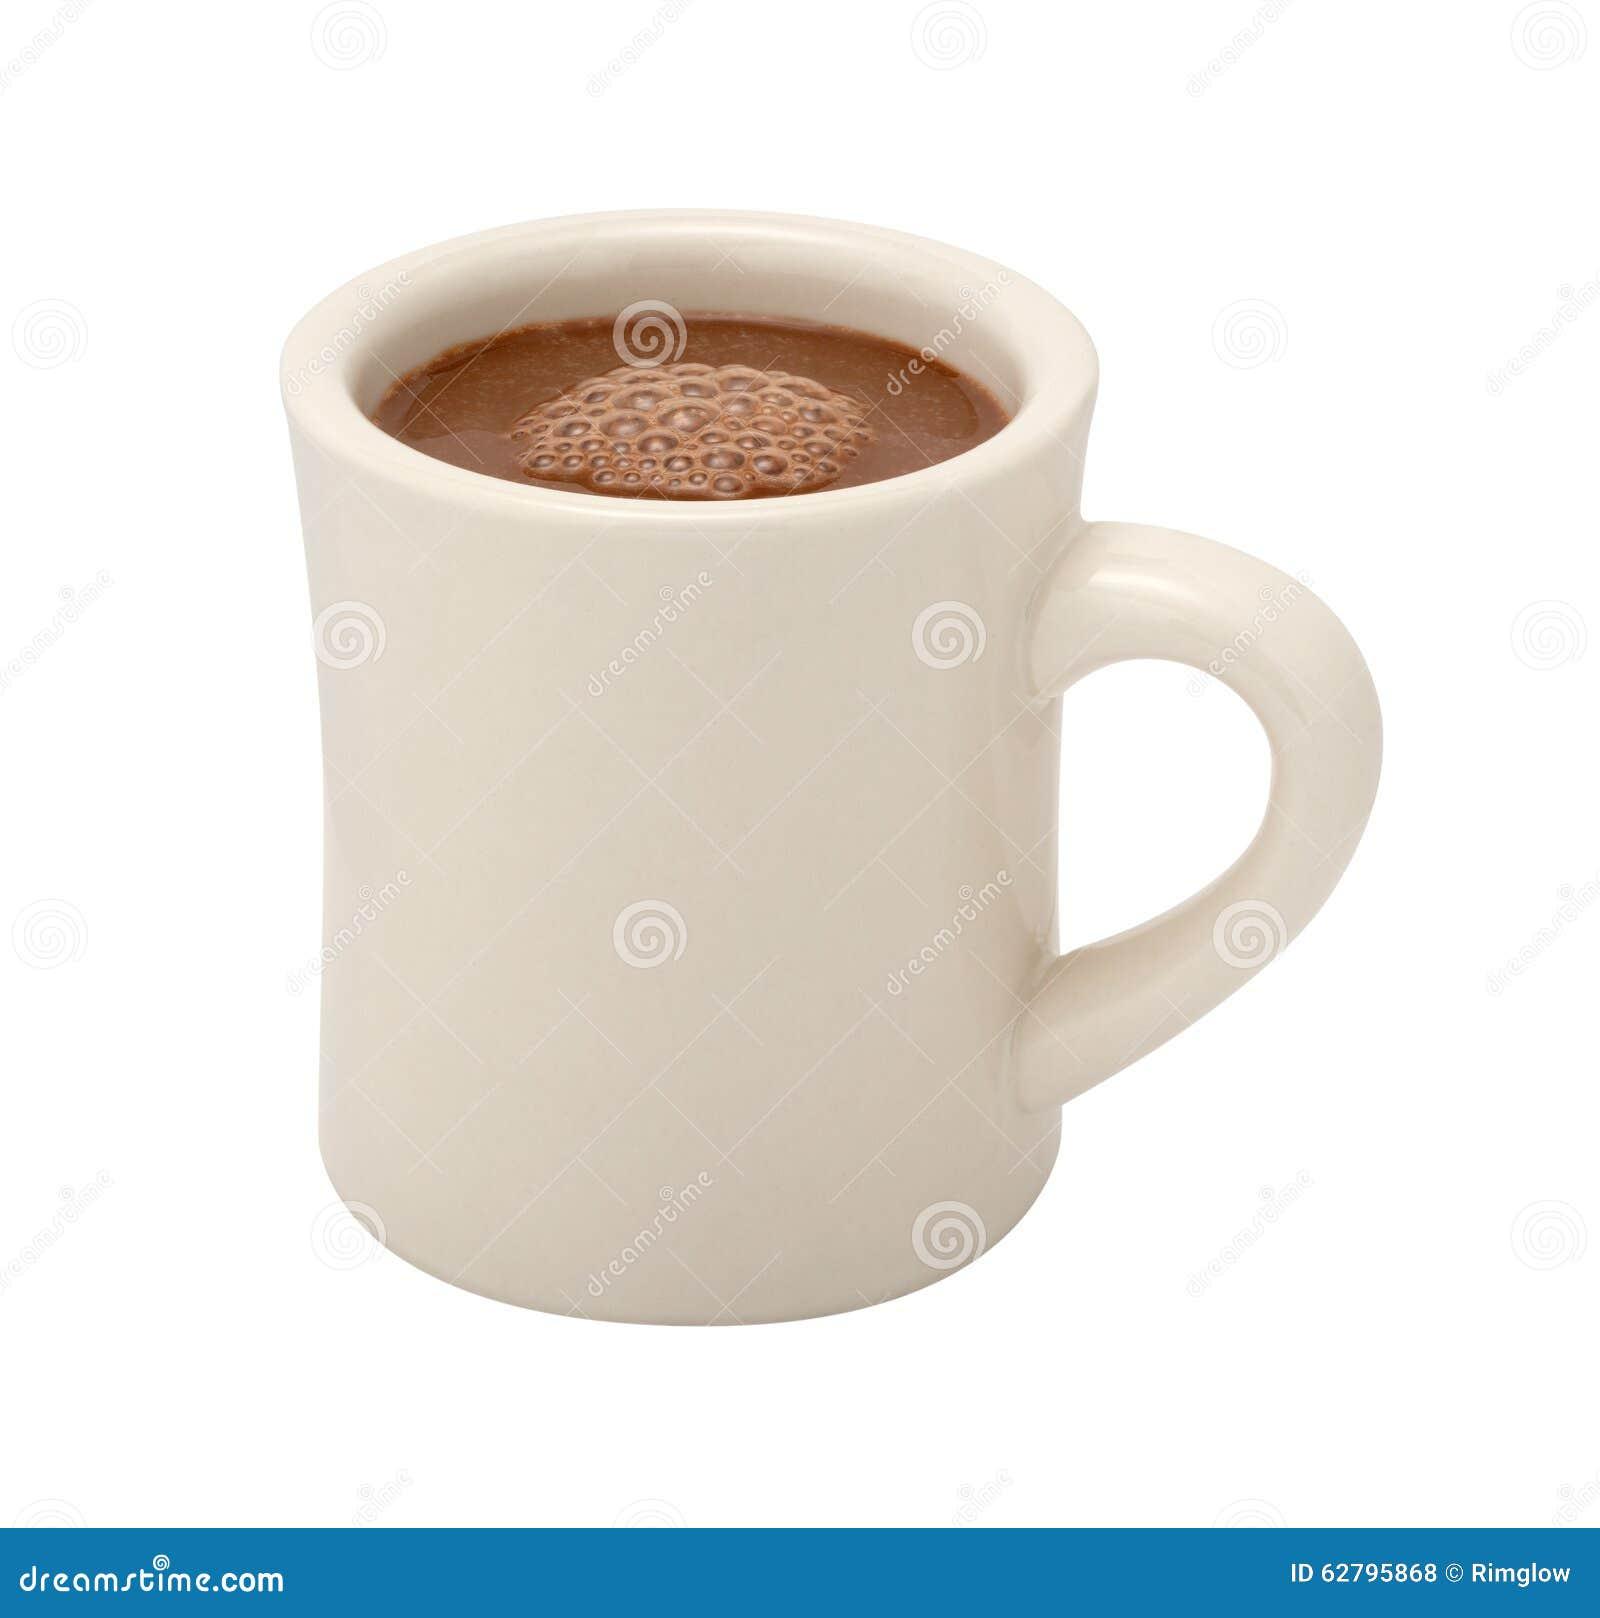 hot coffee white background - photo #12